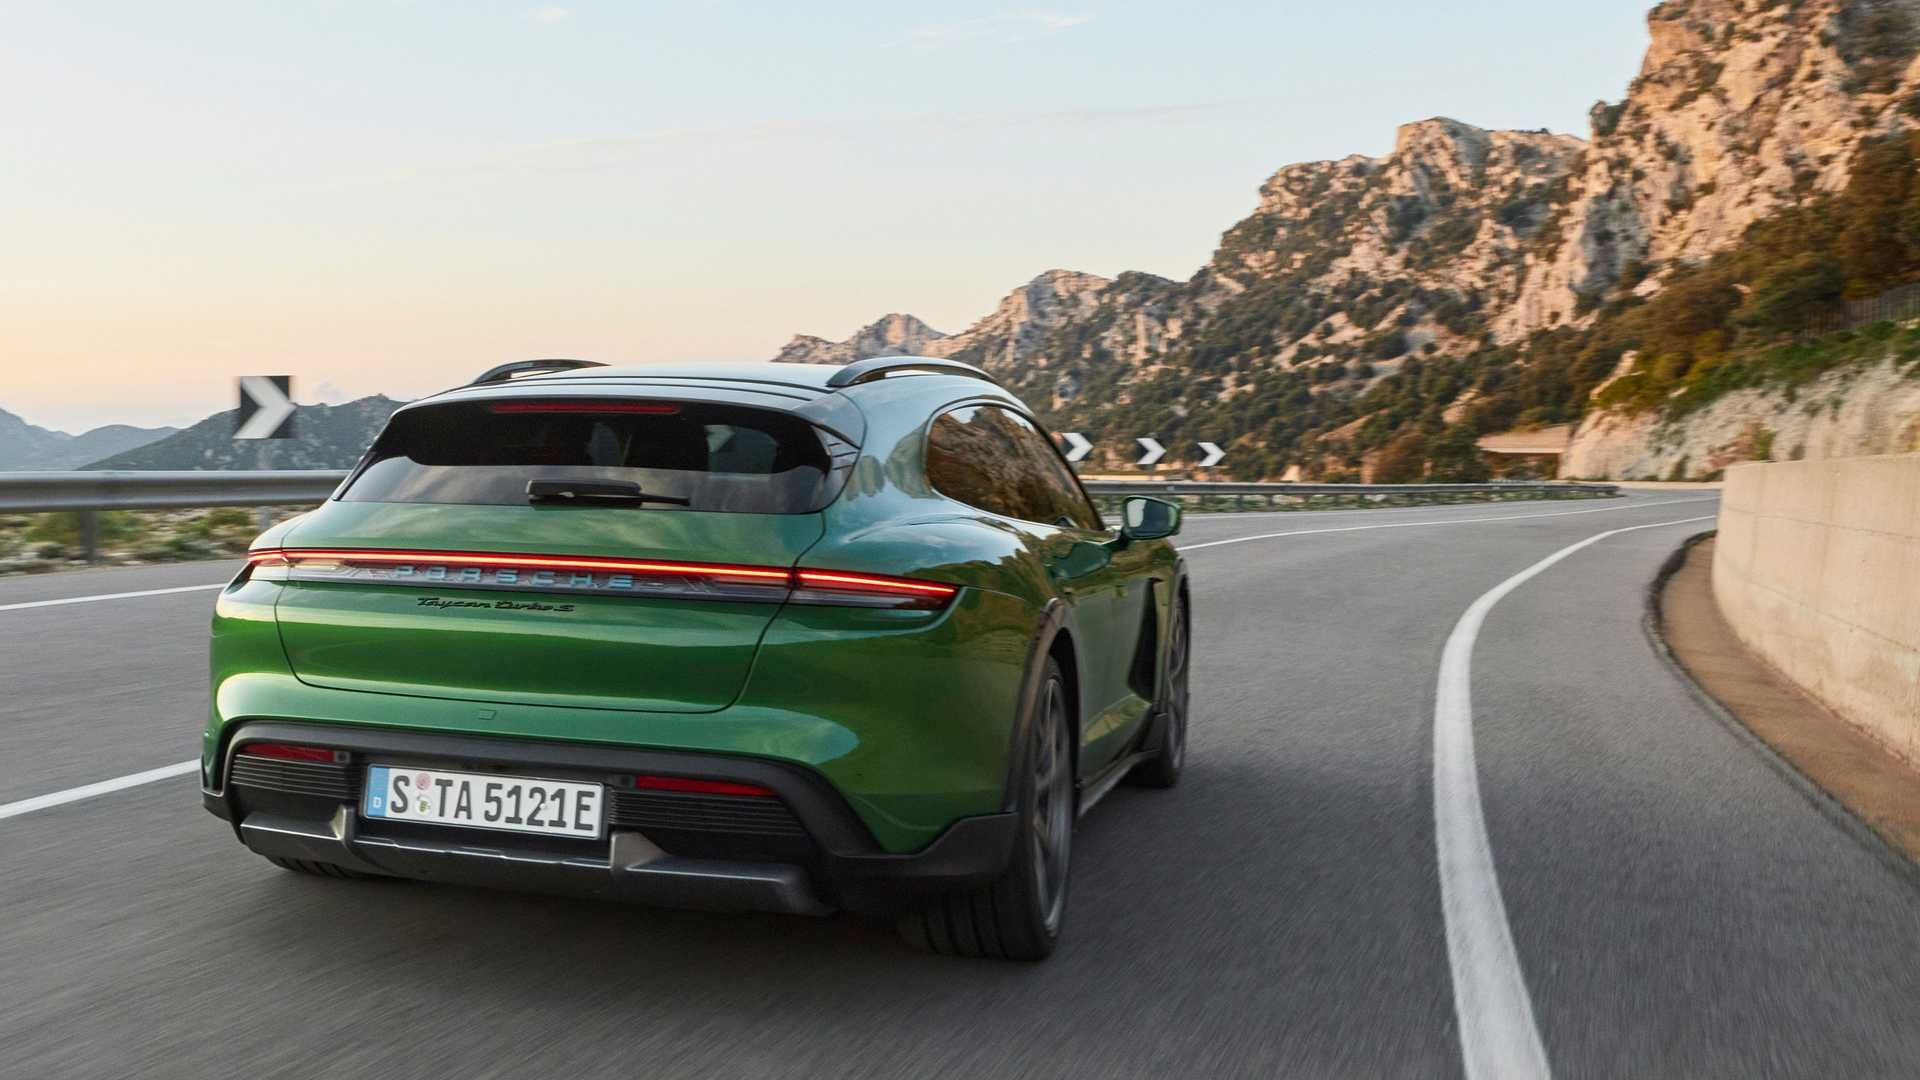 Porsche-Taycan-Cross-Turismo-9